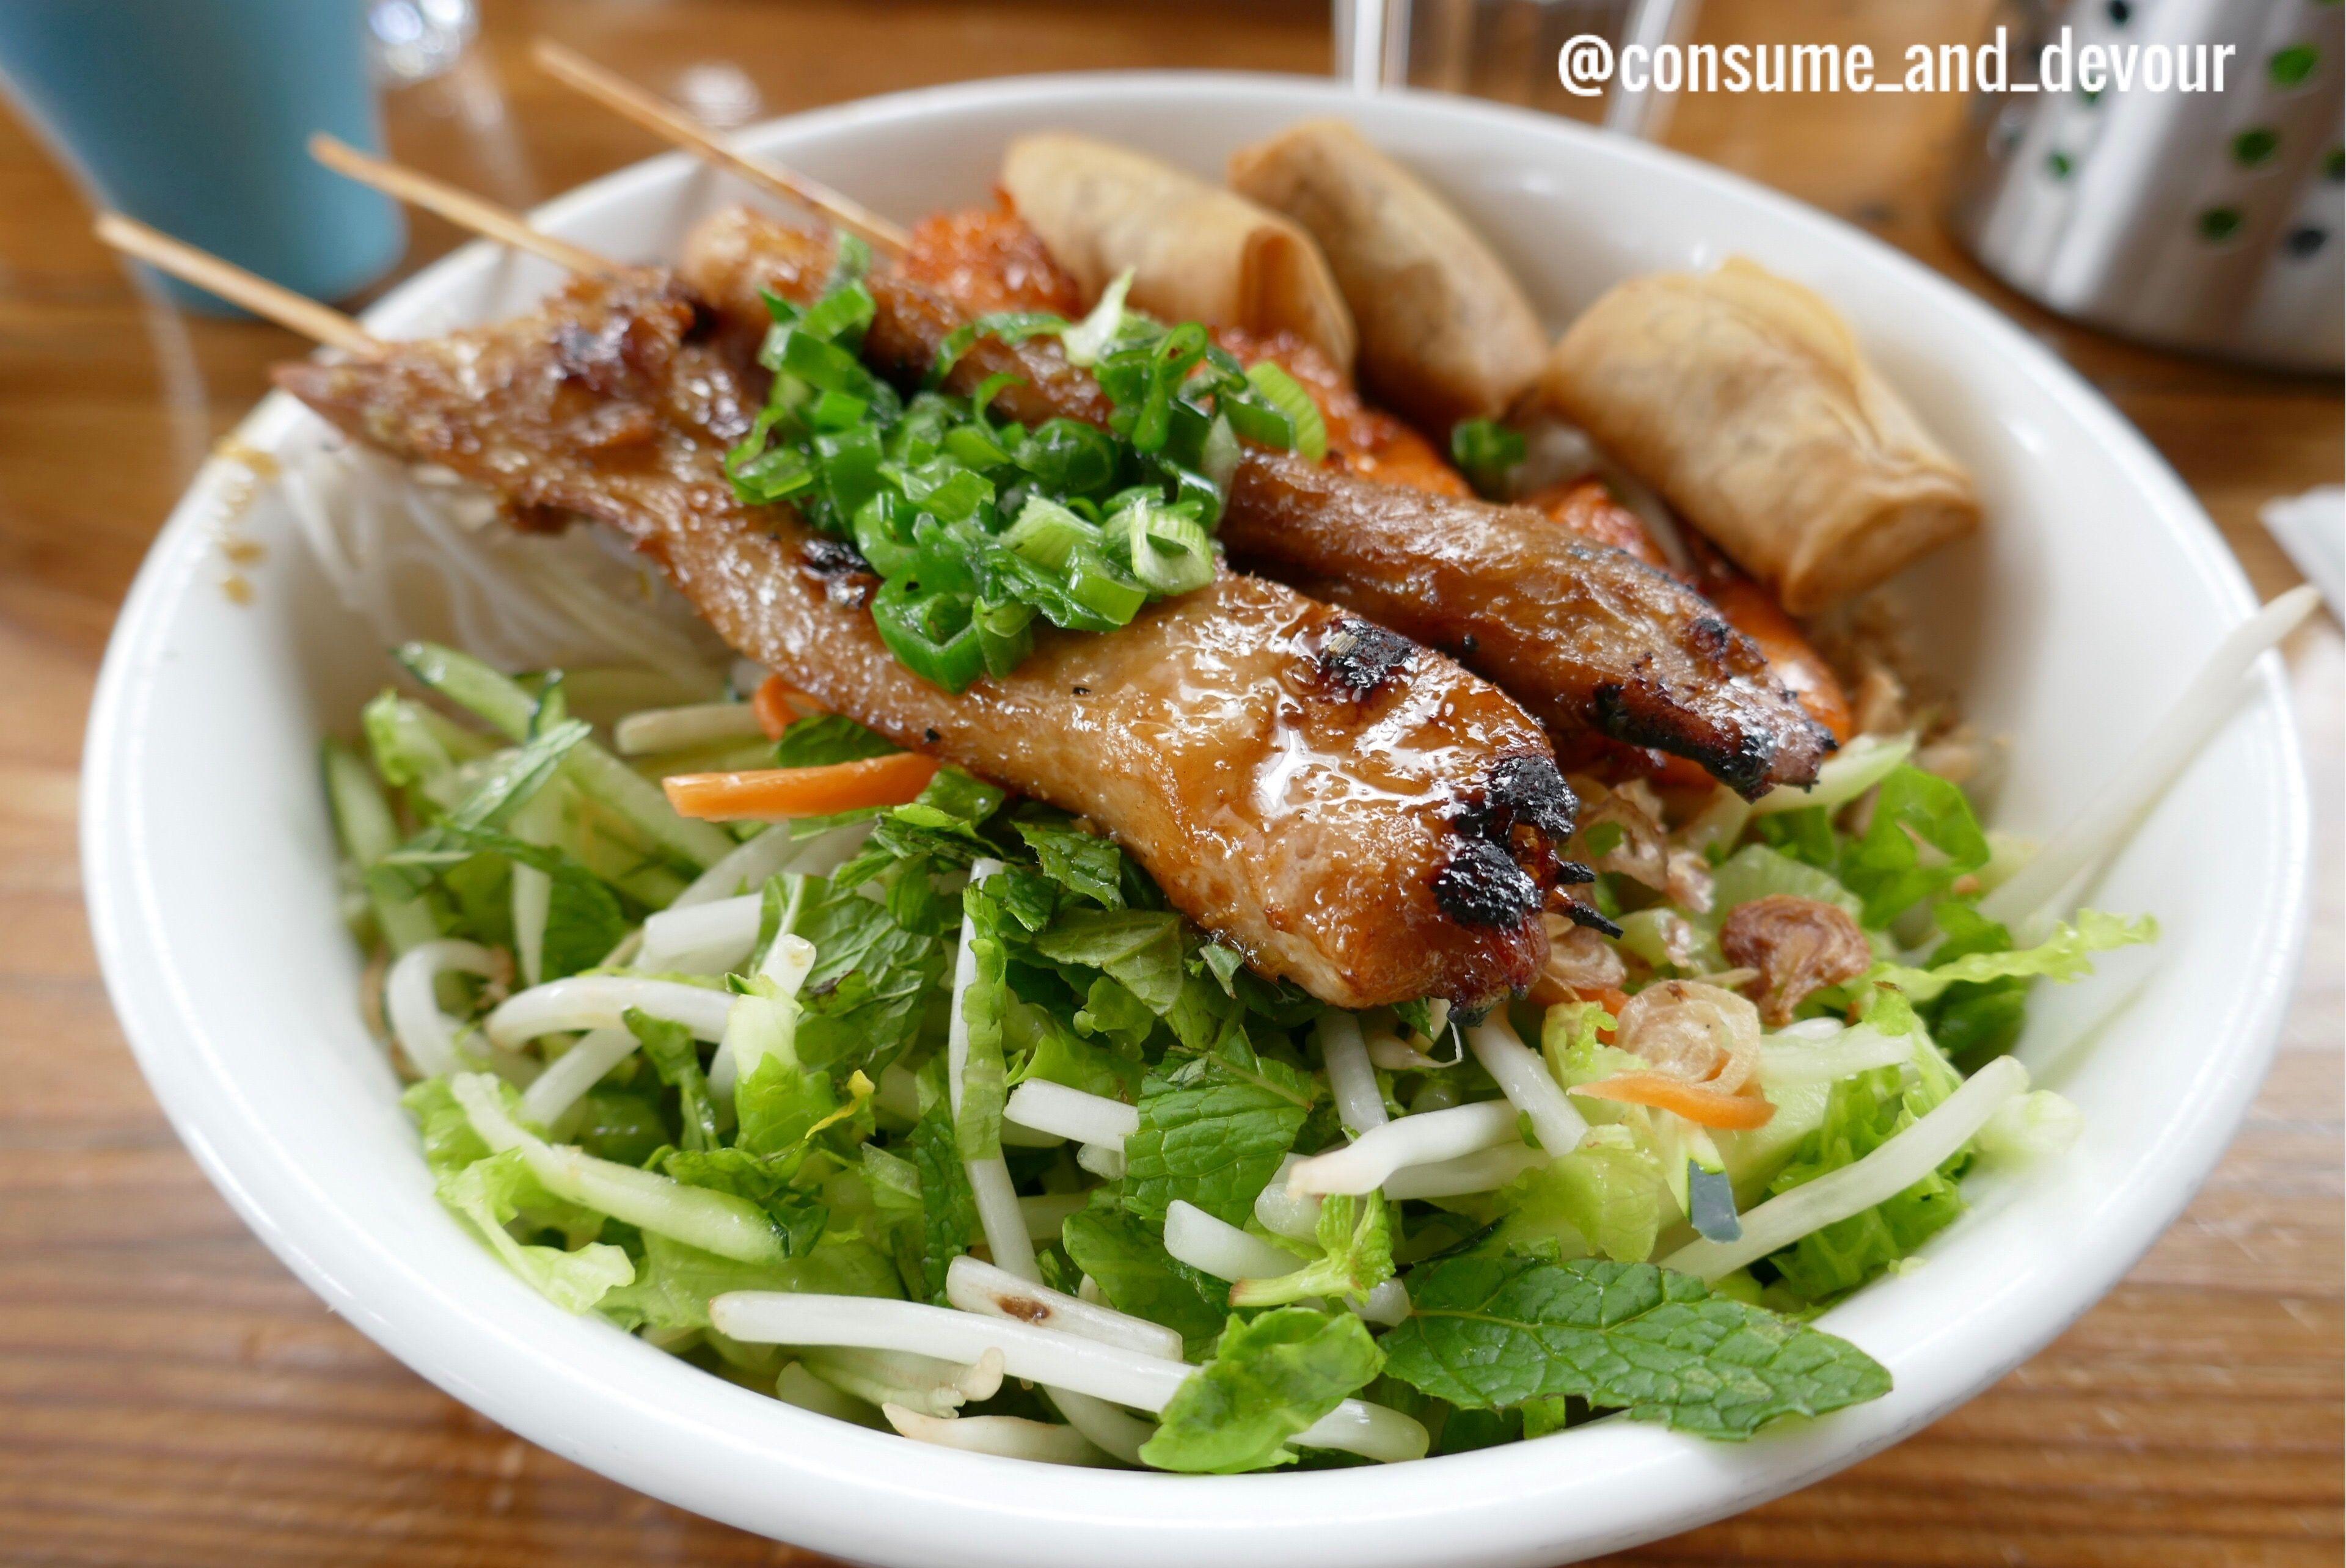 Delicious asian cuisine vermicelli bowl heaven consume